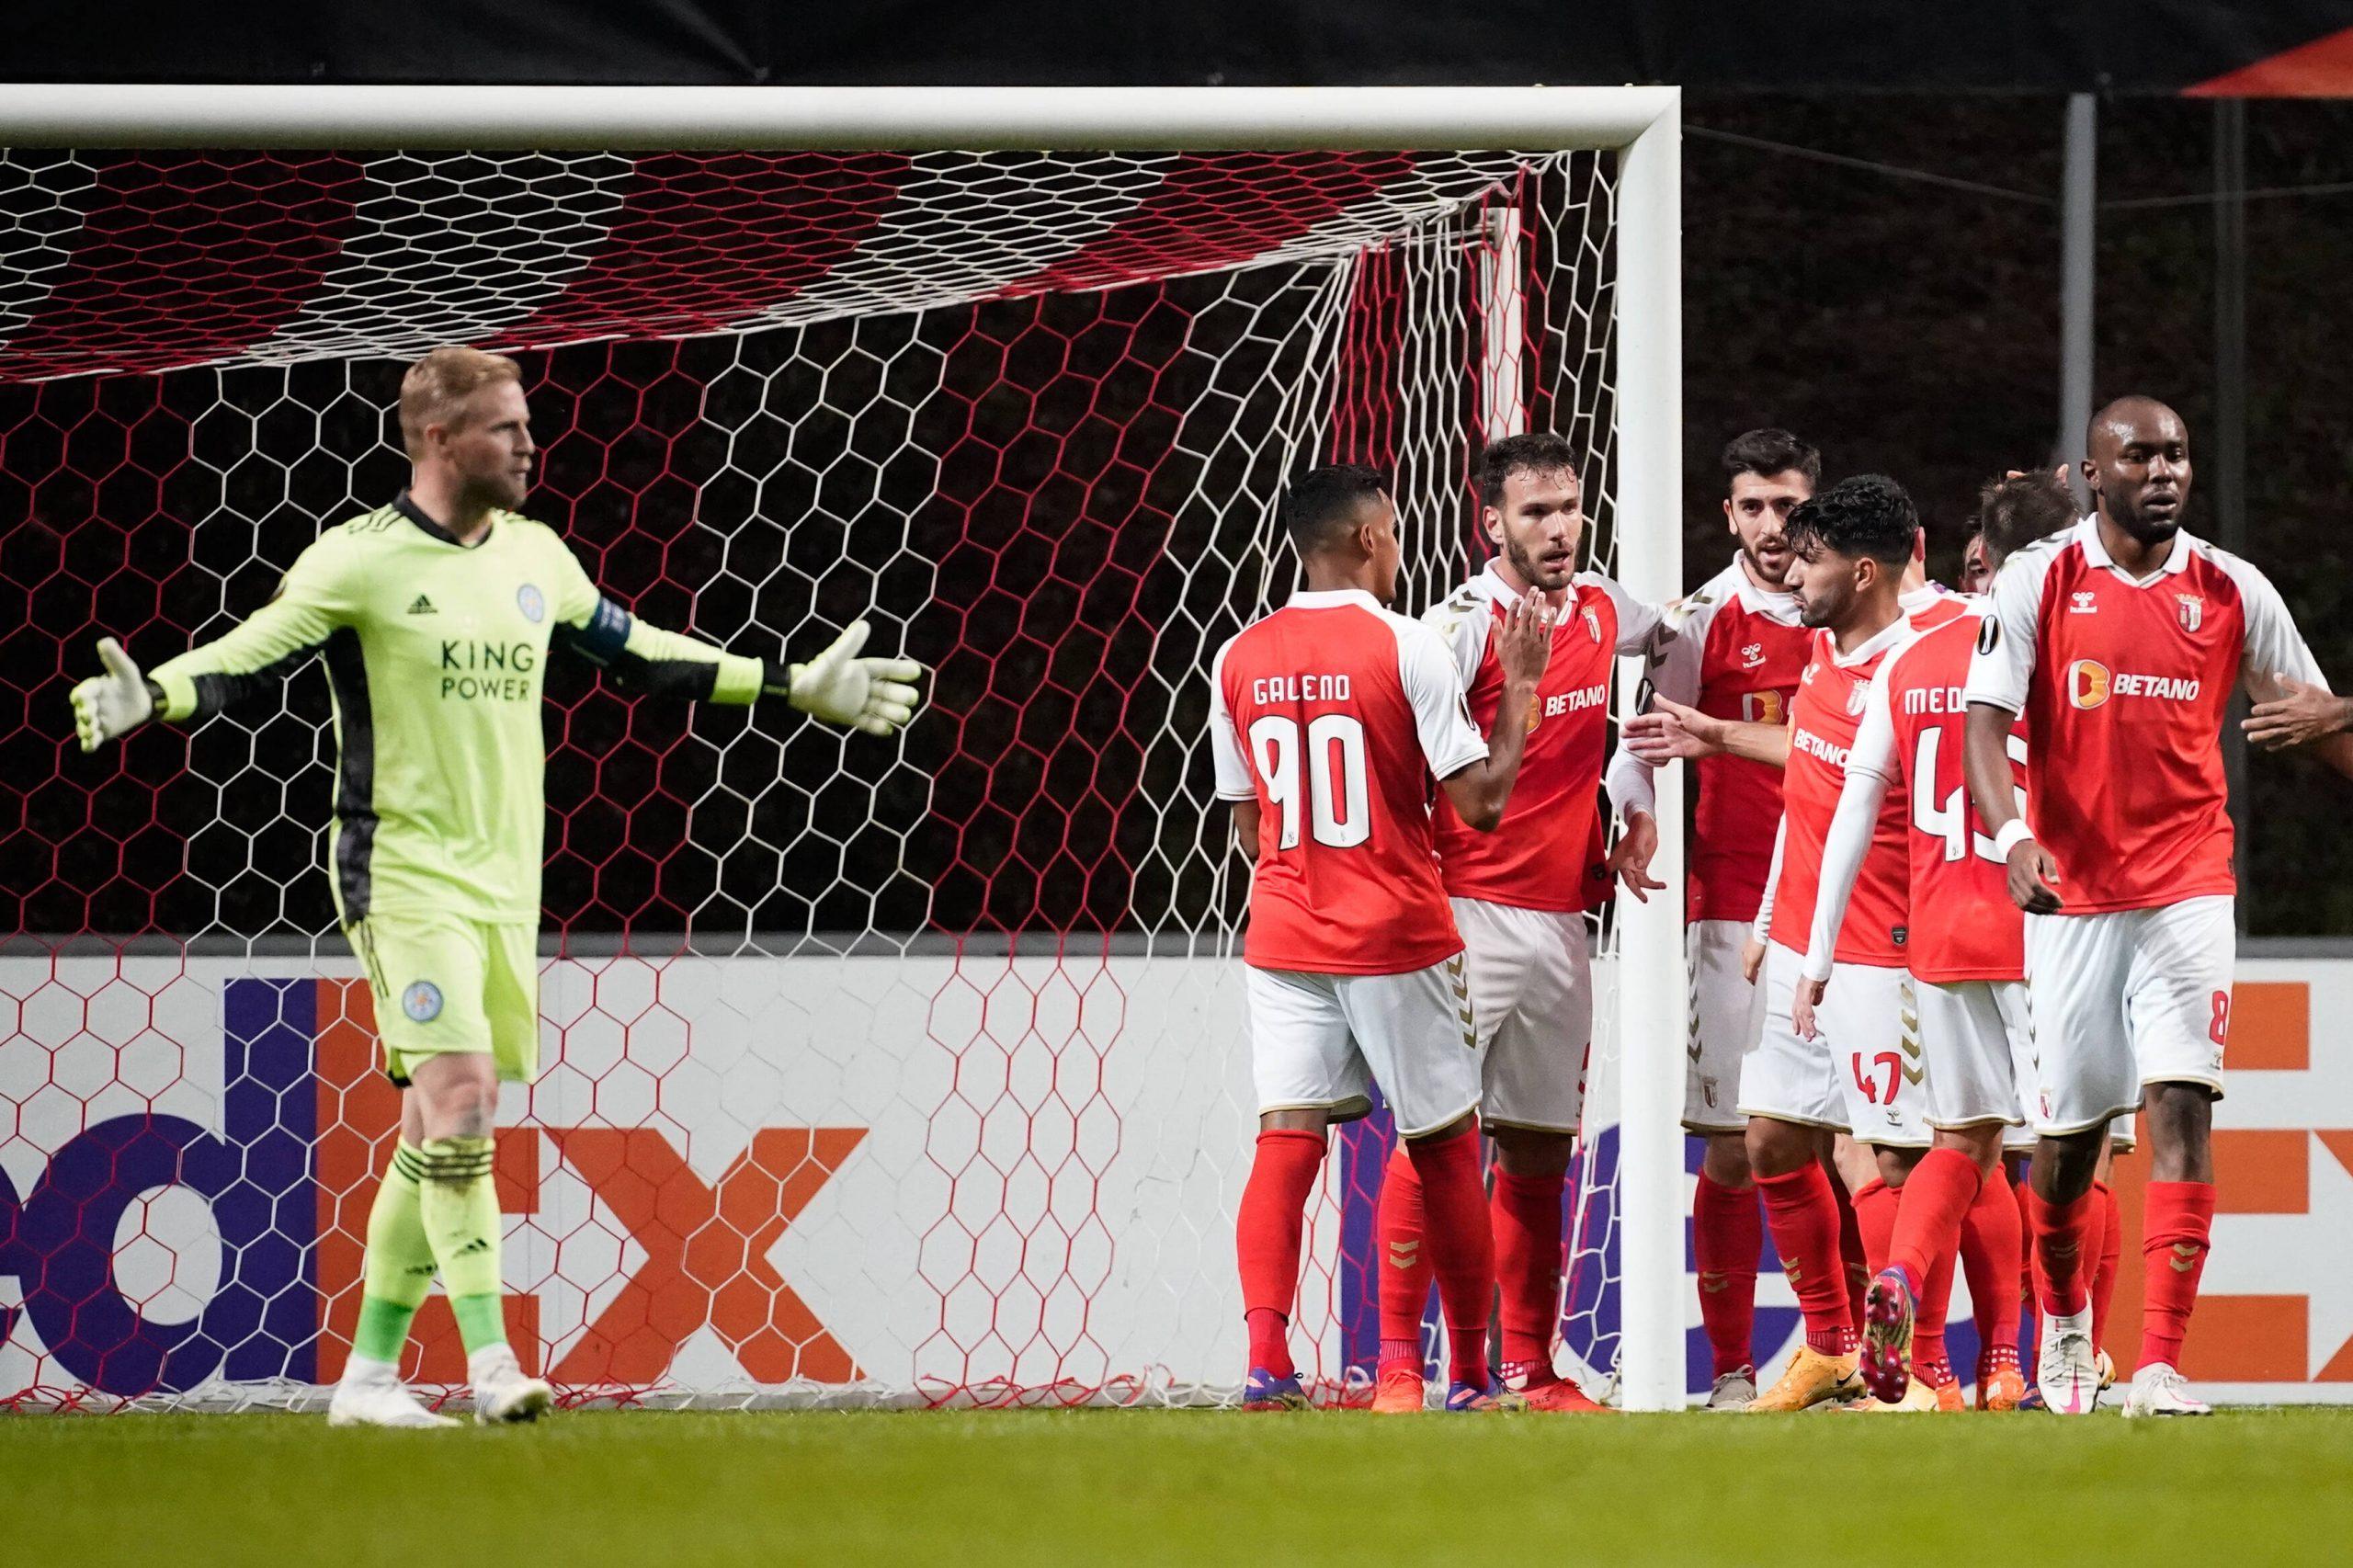 Europa League : le SC Braga affrontera l'AS Roma de Paulo Fonseca